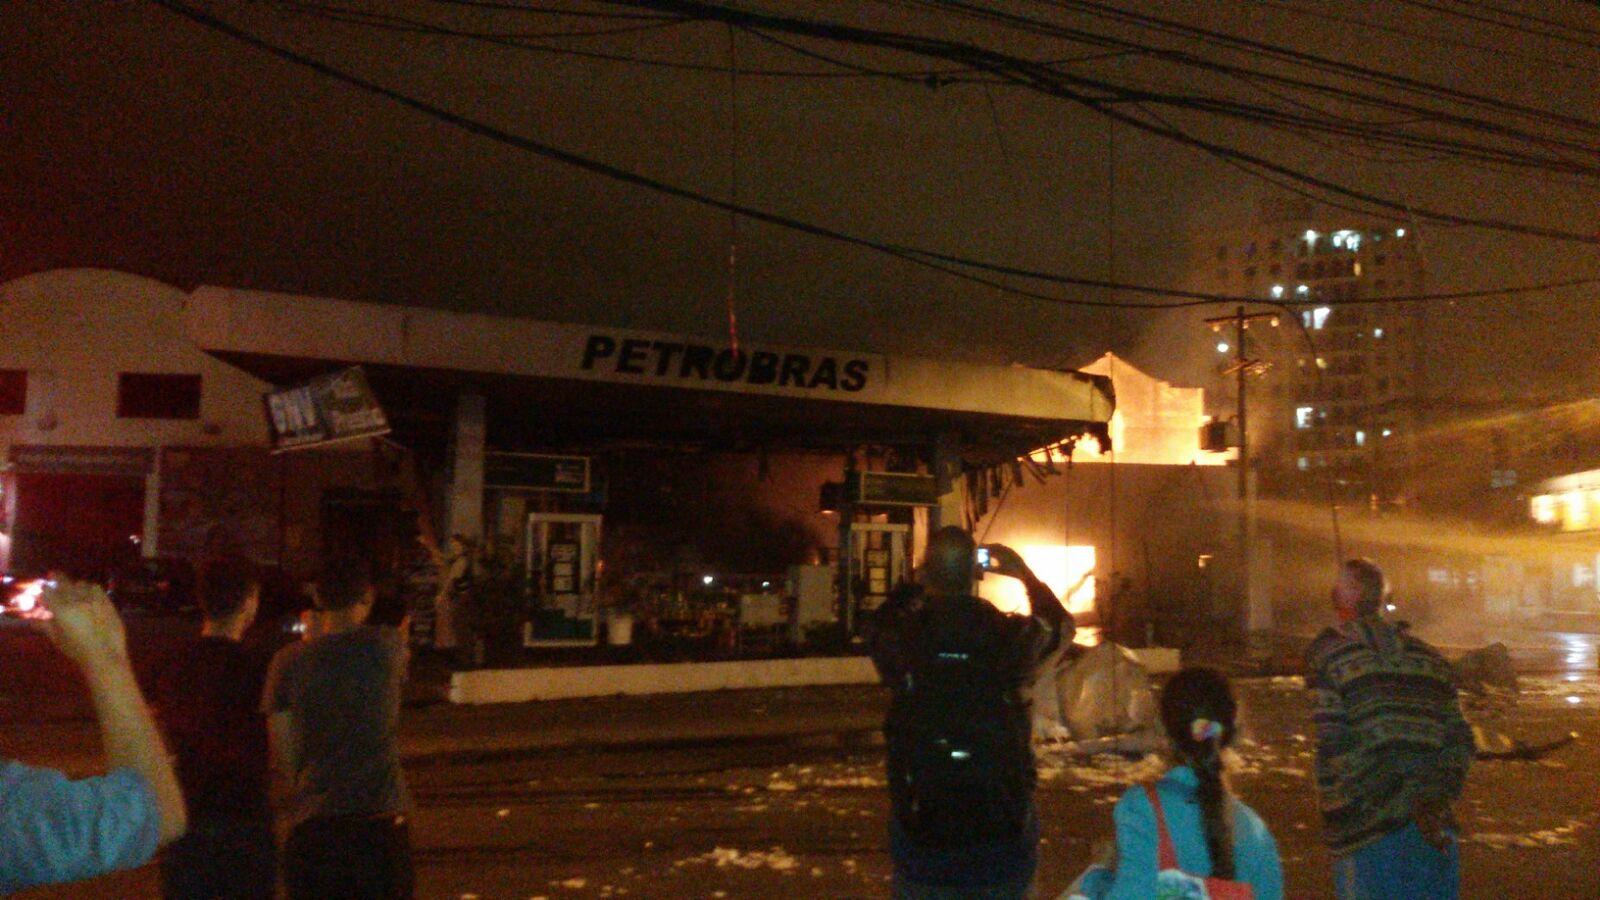 Clientes de supermercado vivem momentos de terror após posto de gasolina explodir na zona norte do Rio